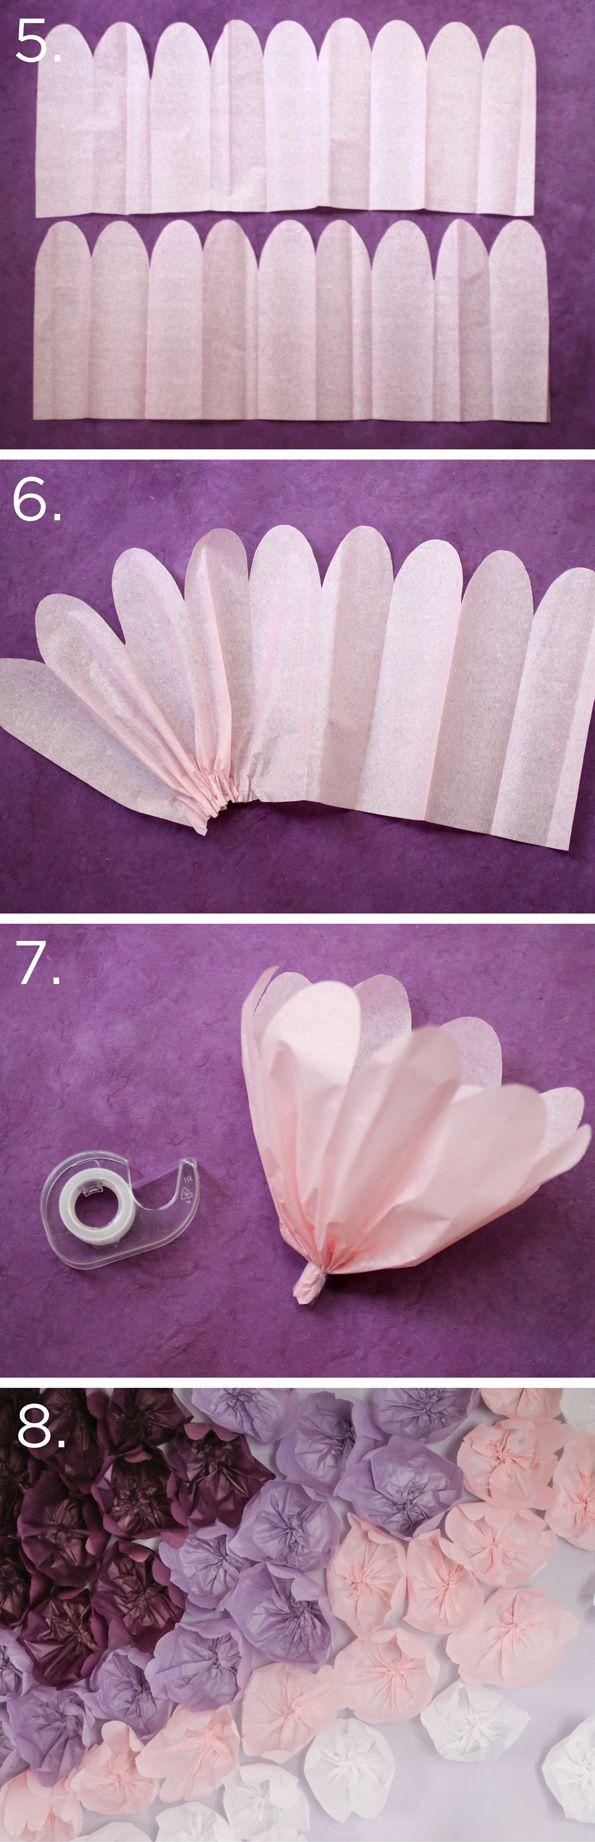 DIY Tissue Flower Backdrop